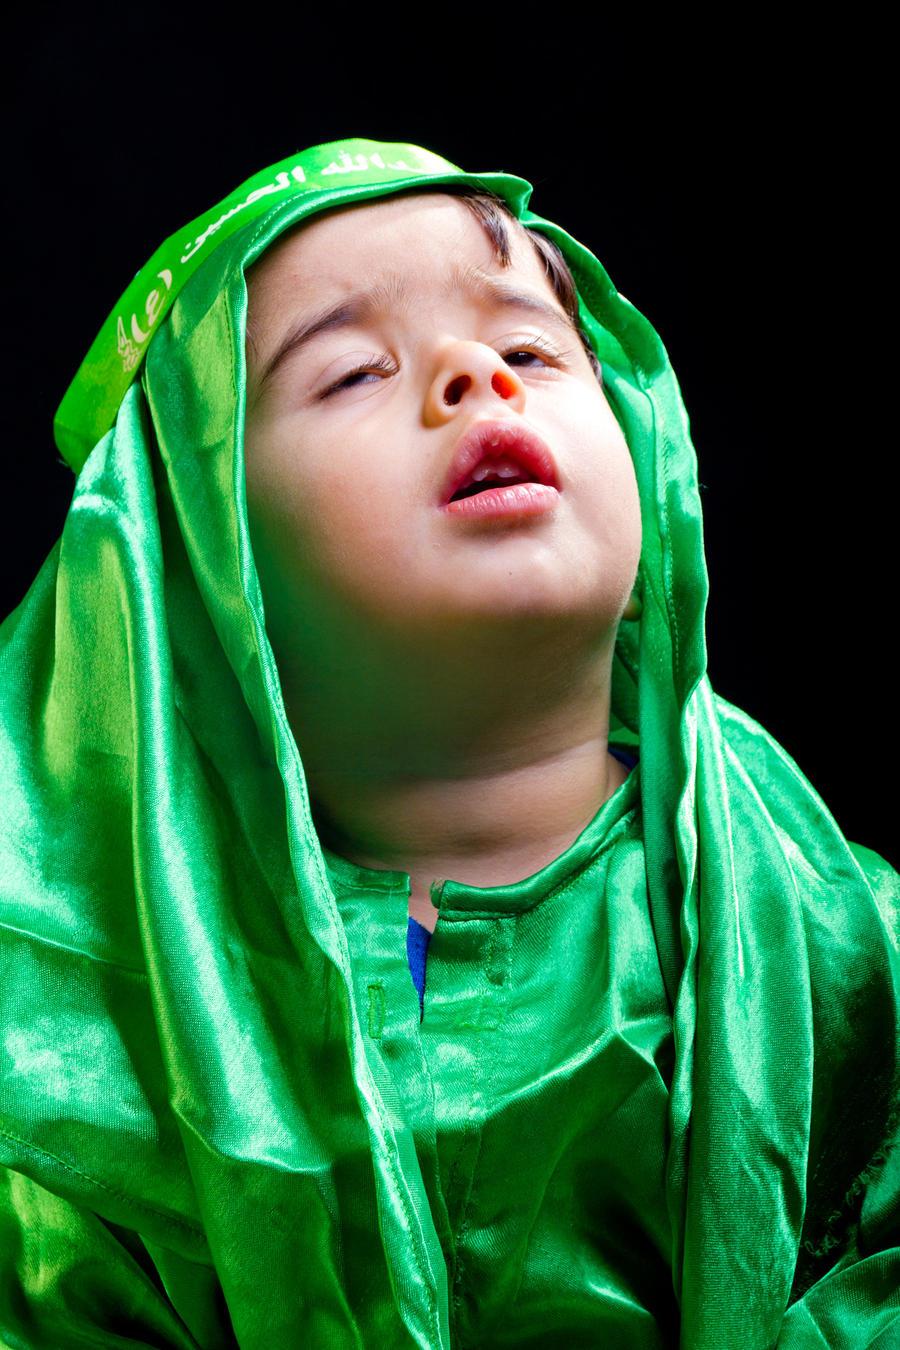 Ali-asghar-Stock03 by HamidSHS - ali_asghar_stock03_by_hamidshs-d34x